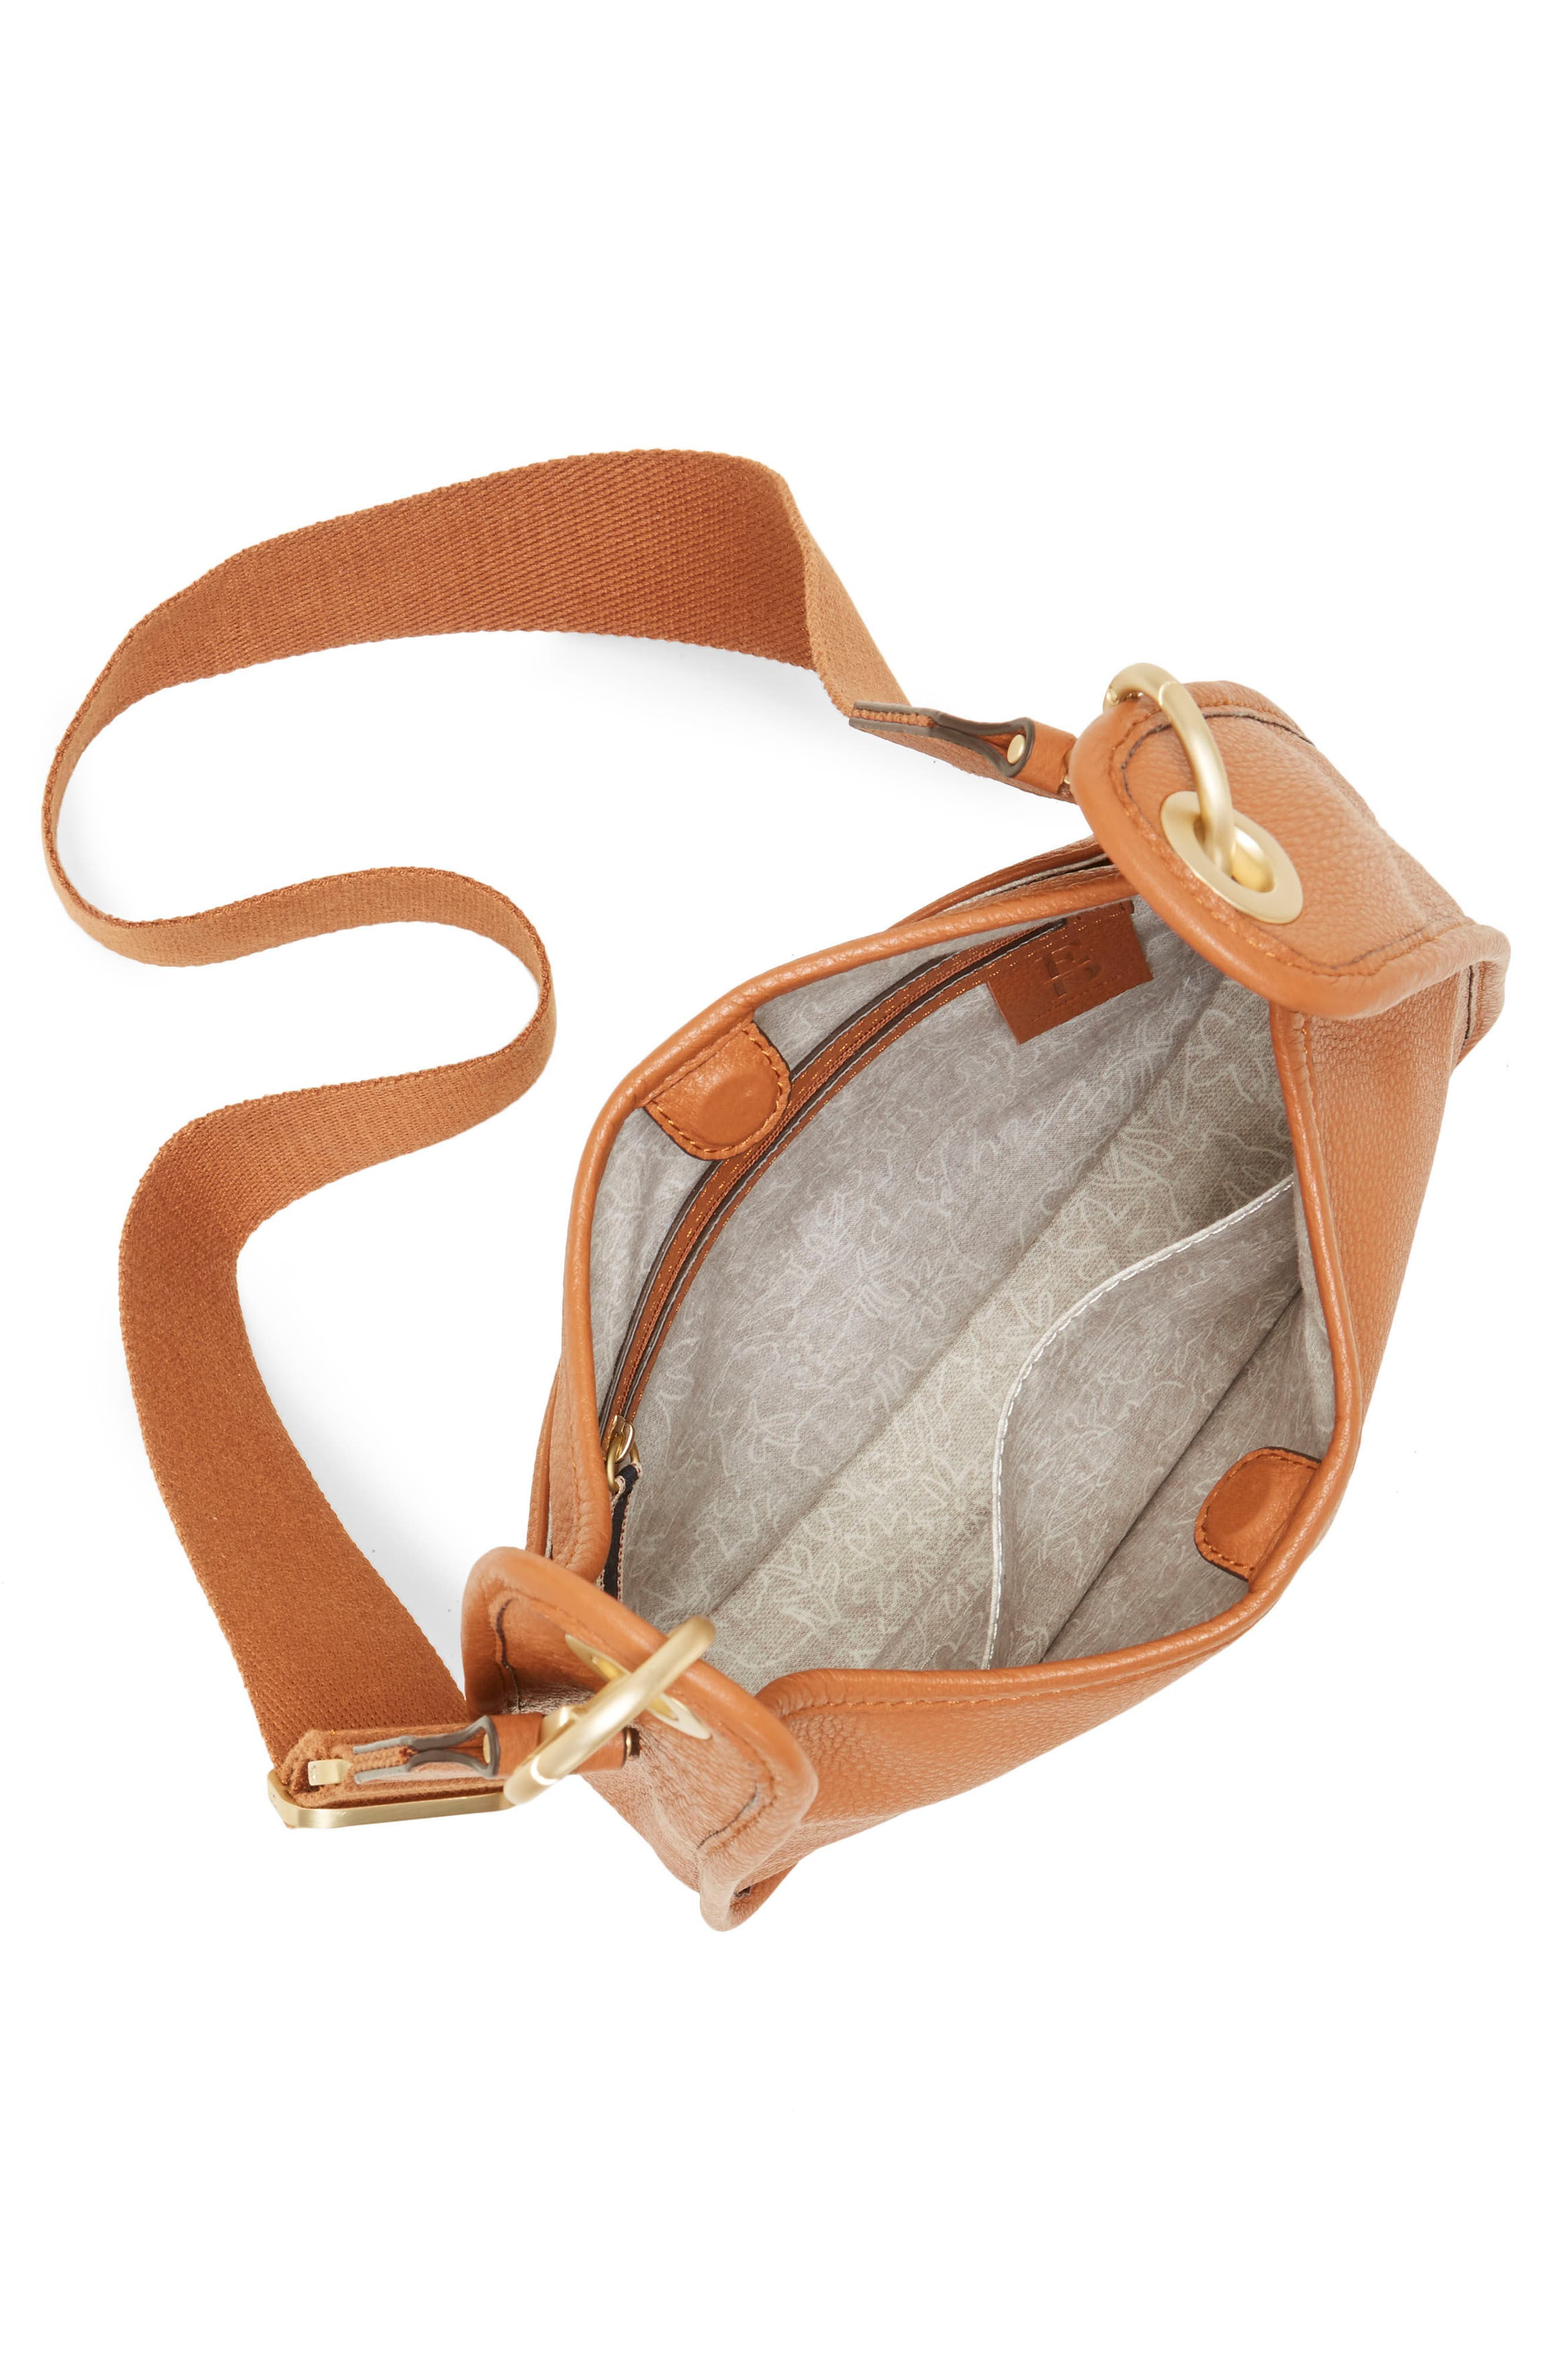 Leather Crossbody Bag,                             Alternate thumbnail 3, color,                             201